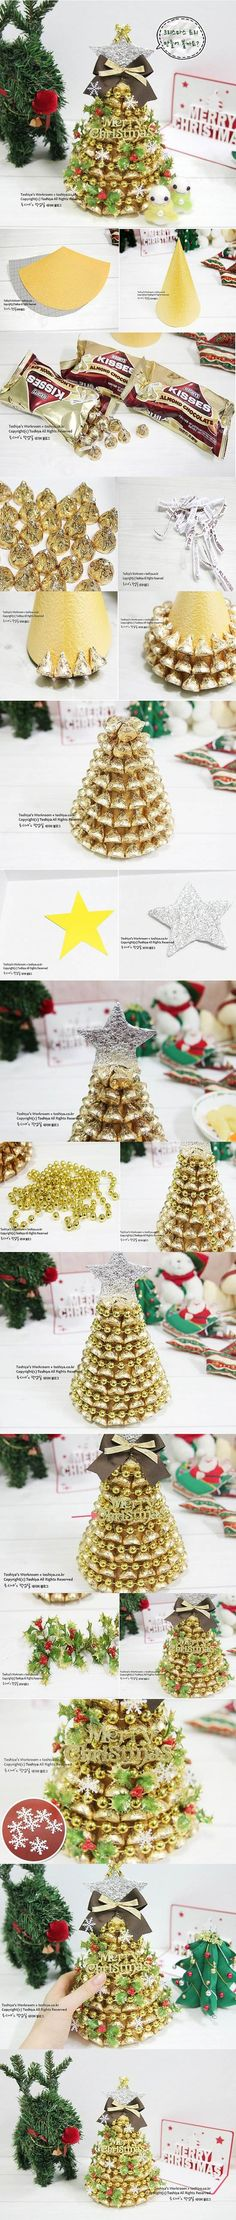 DIY Chocolate Christmas Tree   iCreativeIdeas.com Like Us on Facebook ==> https://www.facebook.com/icreativeideas